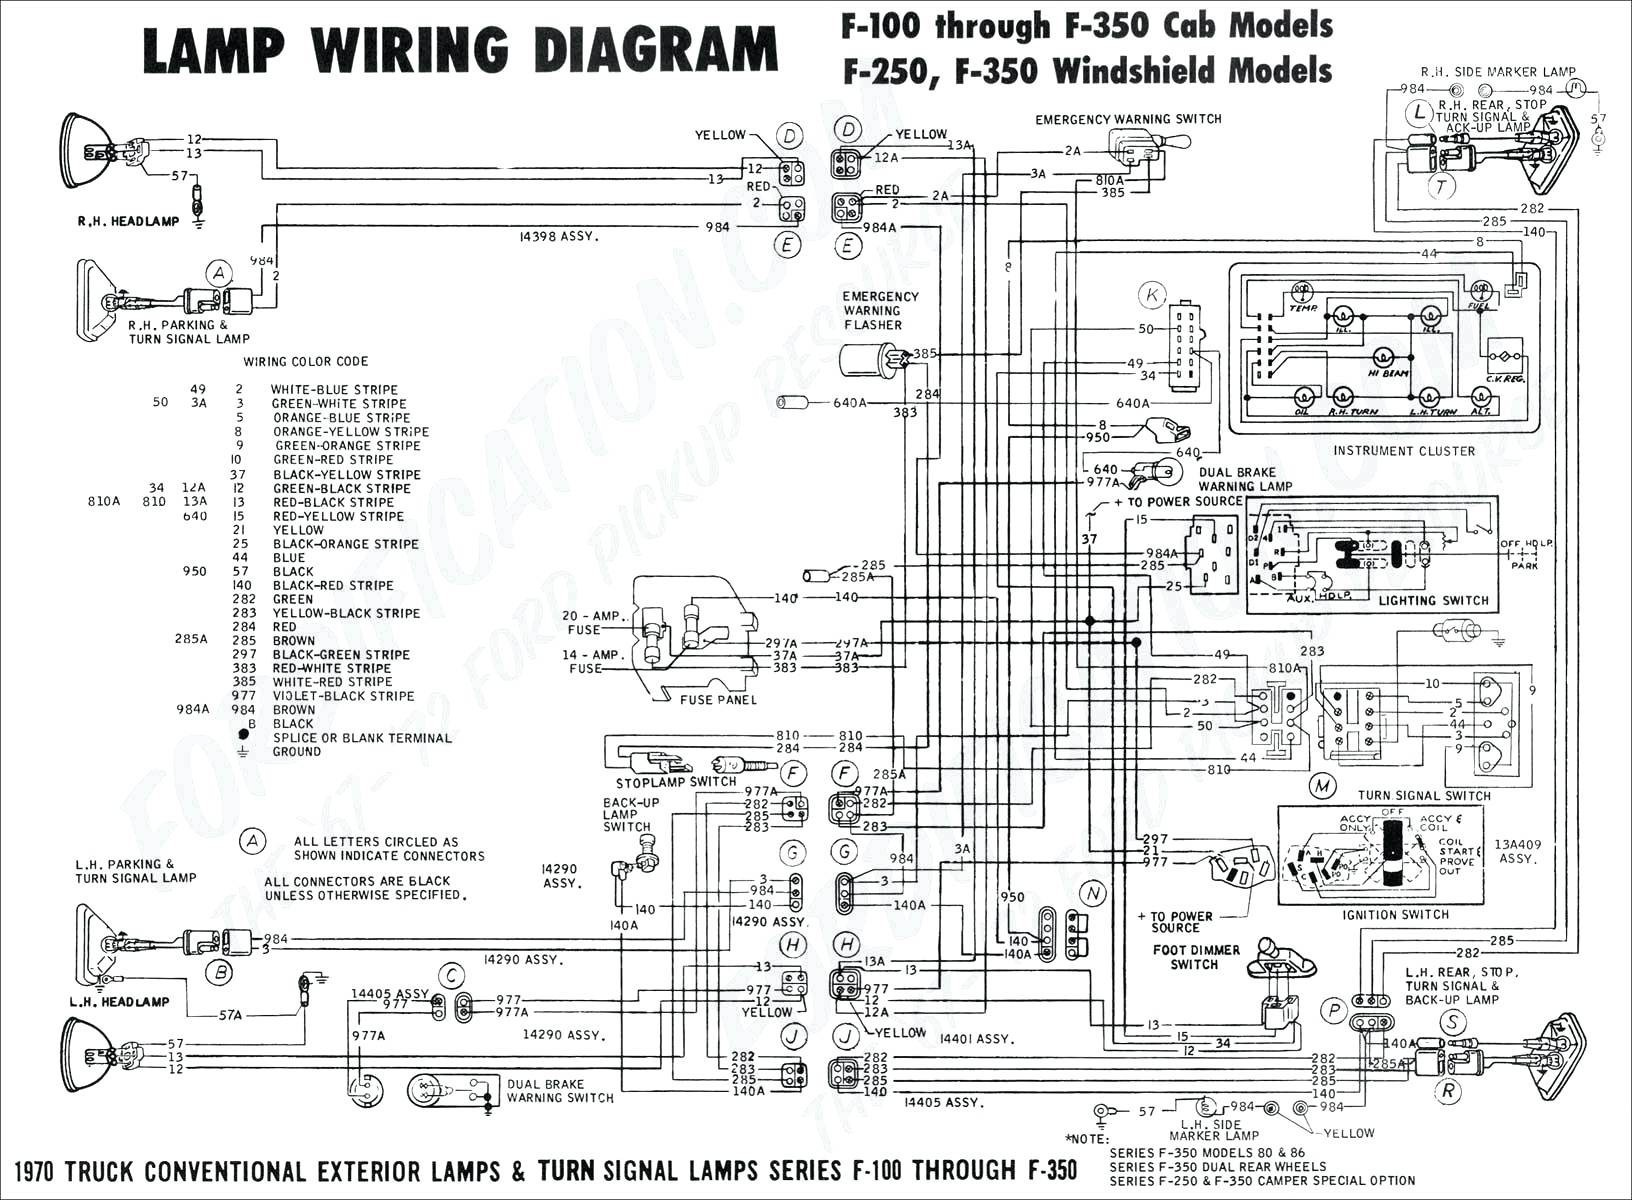 Chevy 454 Engine Diagram 1990 Chevy 1500 Belt Diagram Another Blog About Wiring Diagram • Of Chevy 454 Engine Diagram